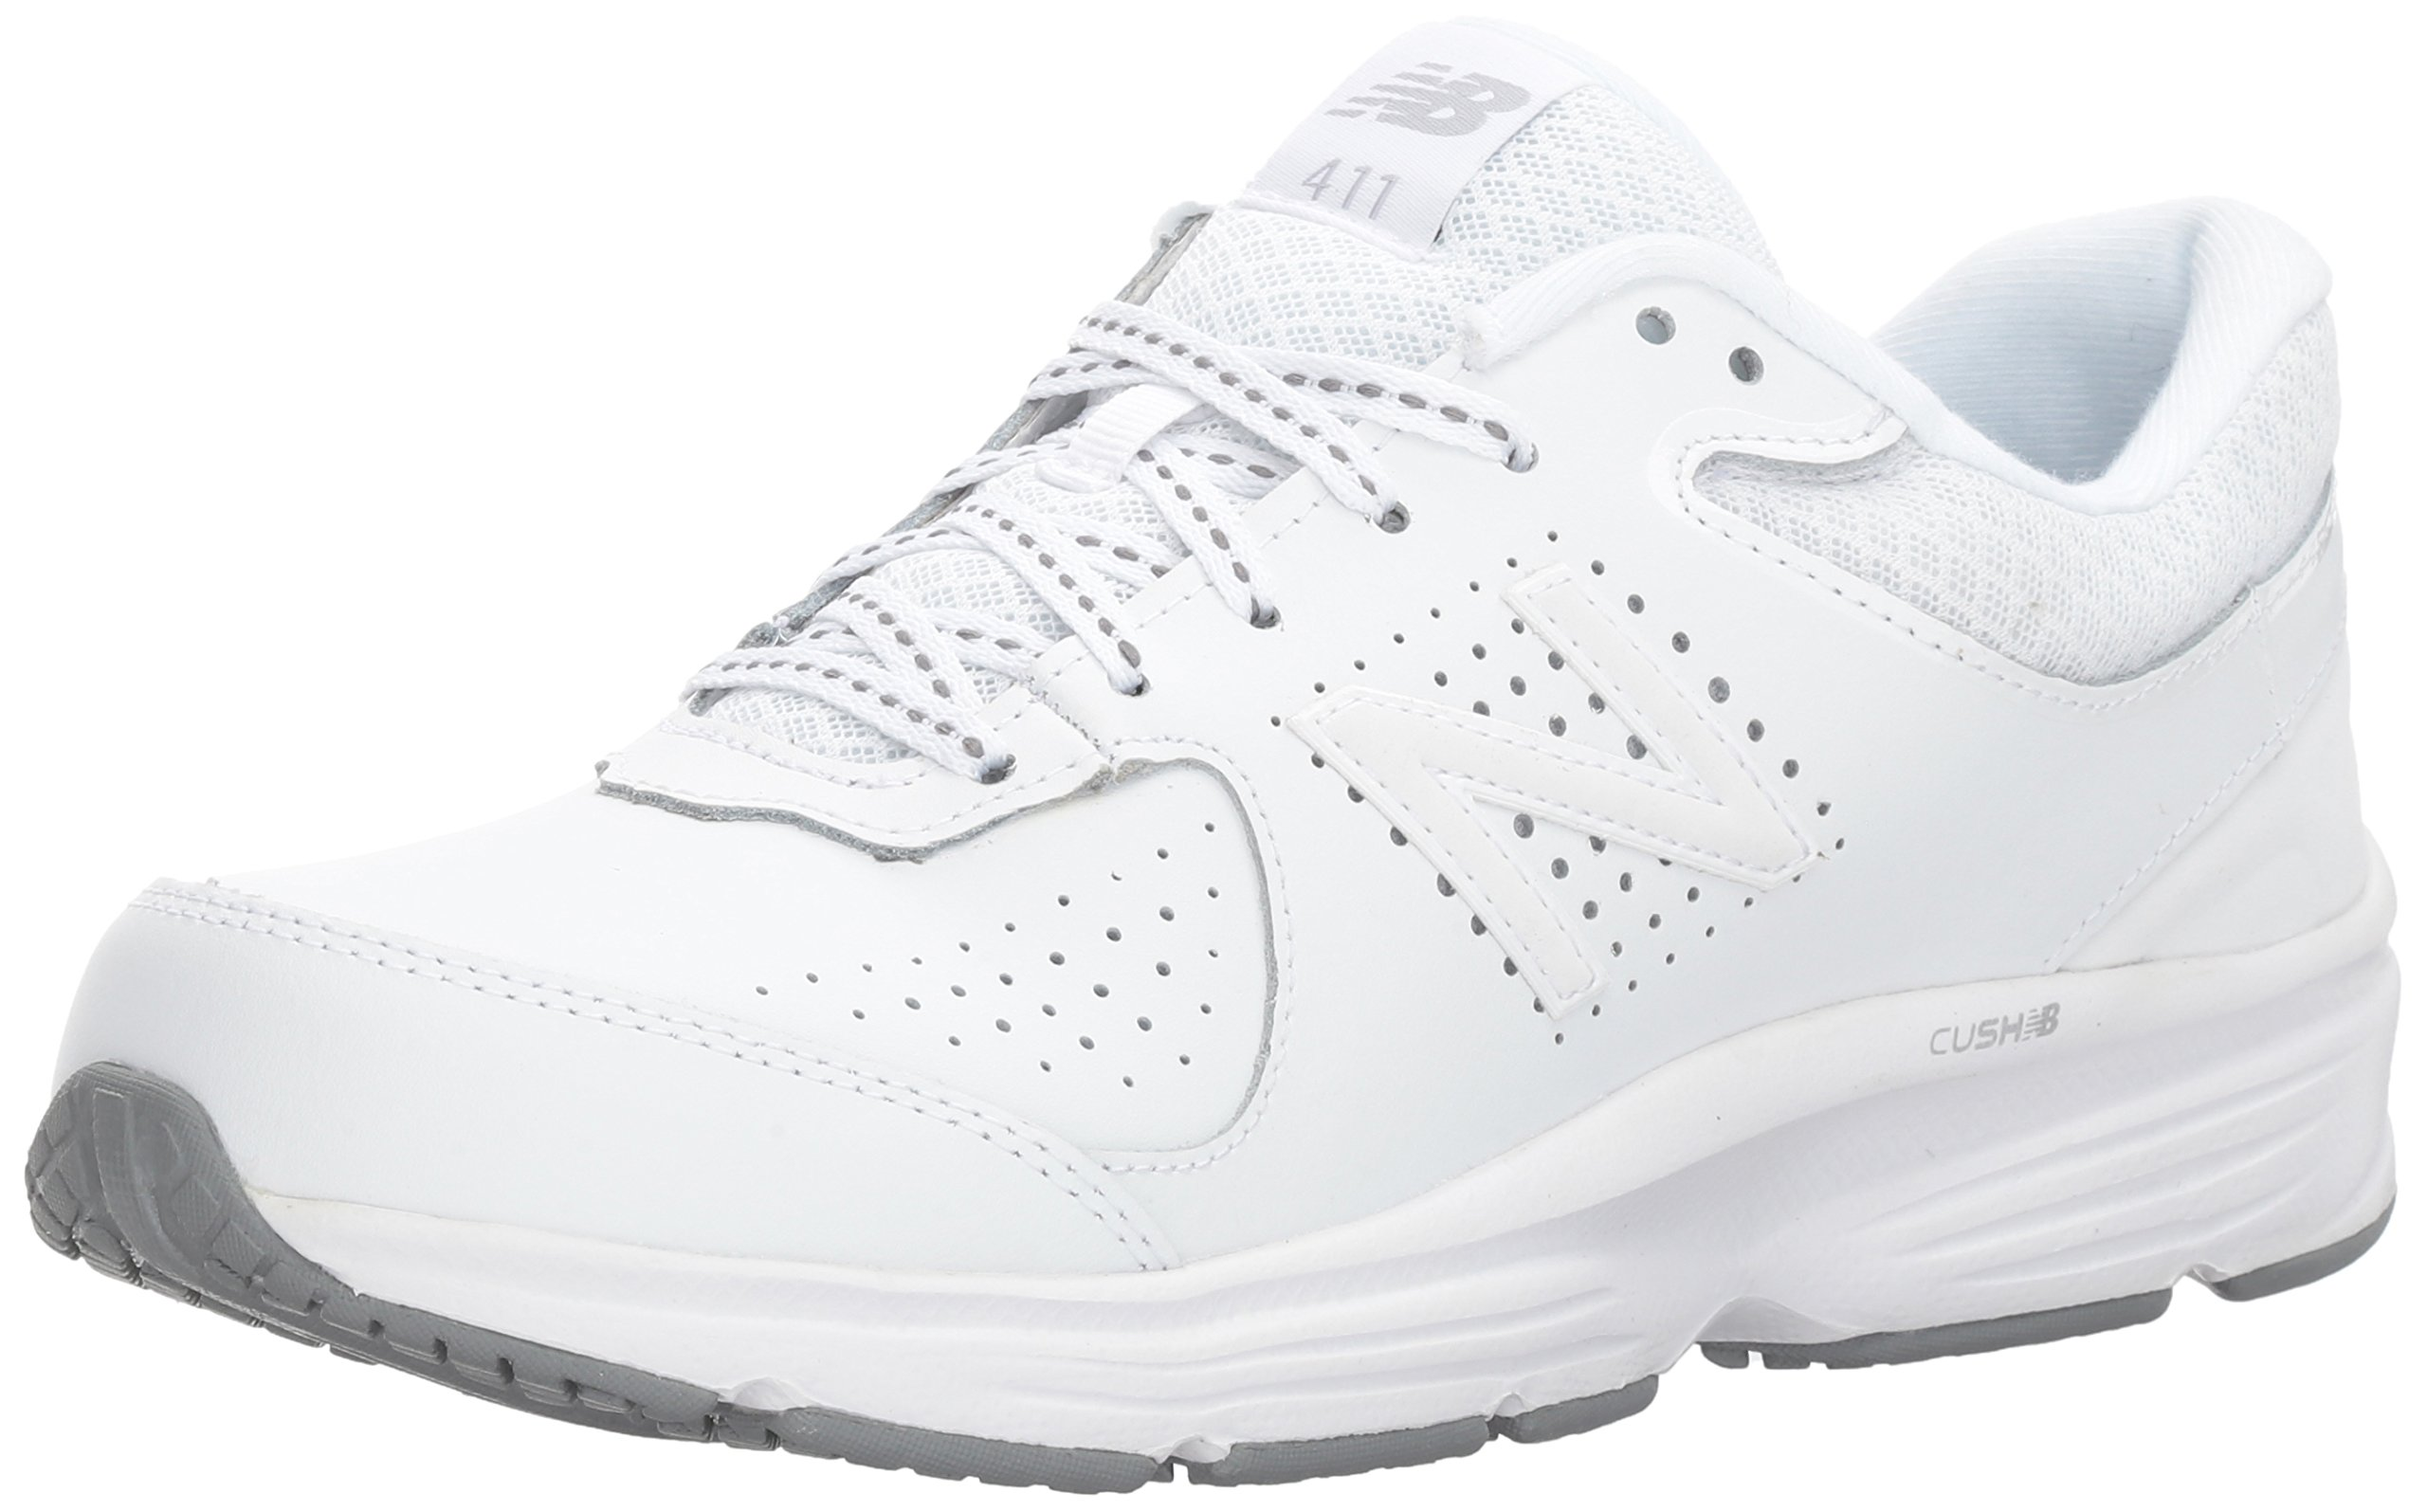 New Balance Women's WW411v2 Walking Shoe, White, 7.5 D US